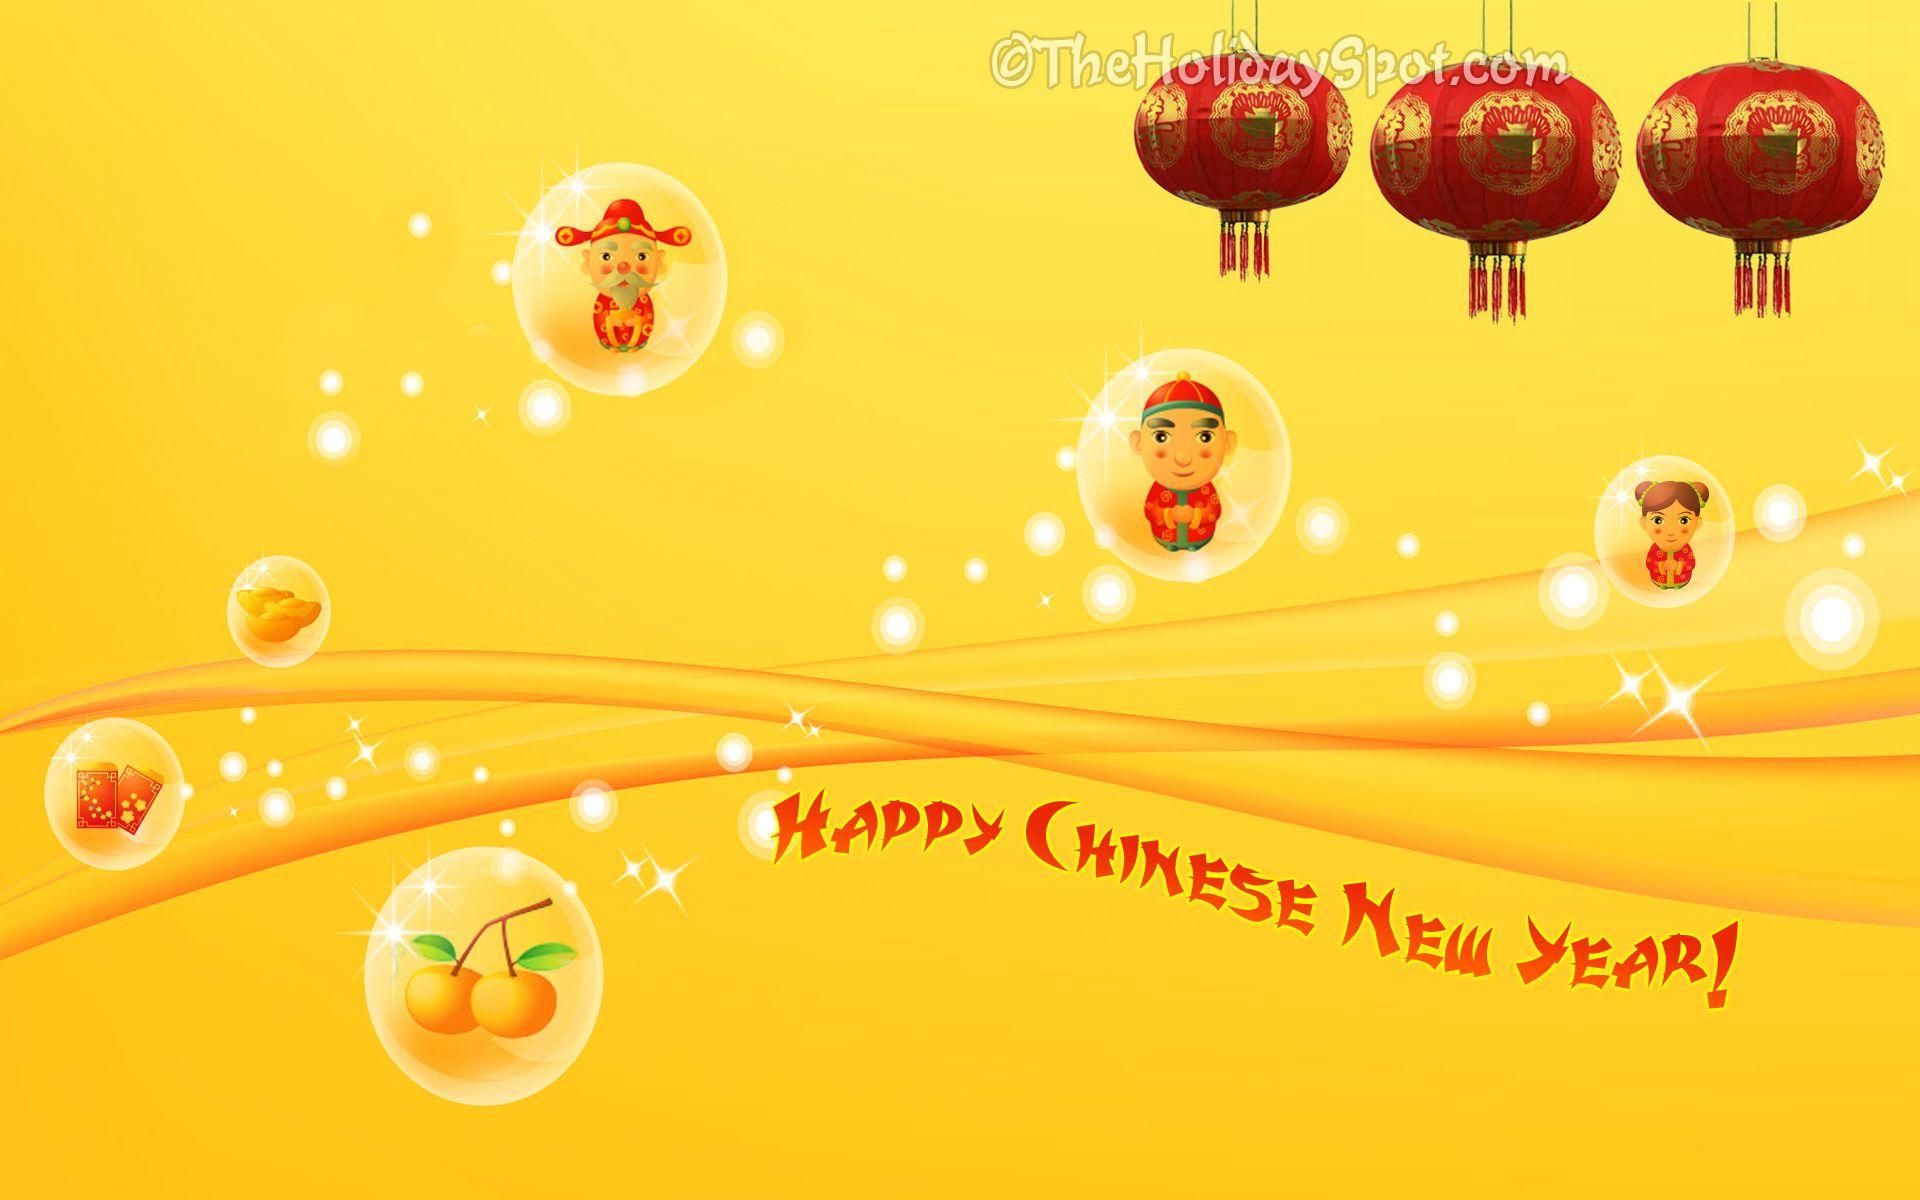 Cute chinese new year wallpaper for desktop chinese new year cute chinese new year wallpaper for desktop kristyandbryce Choice Image